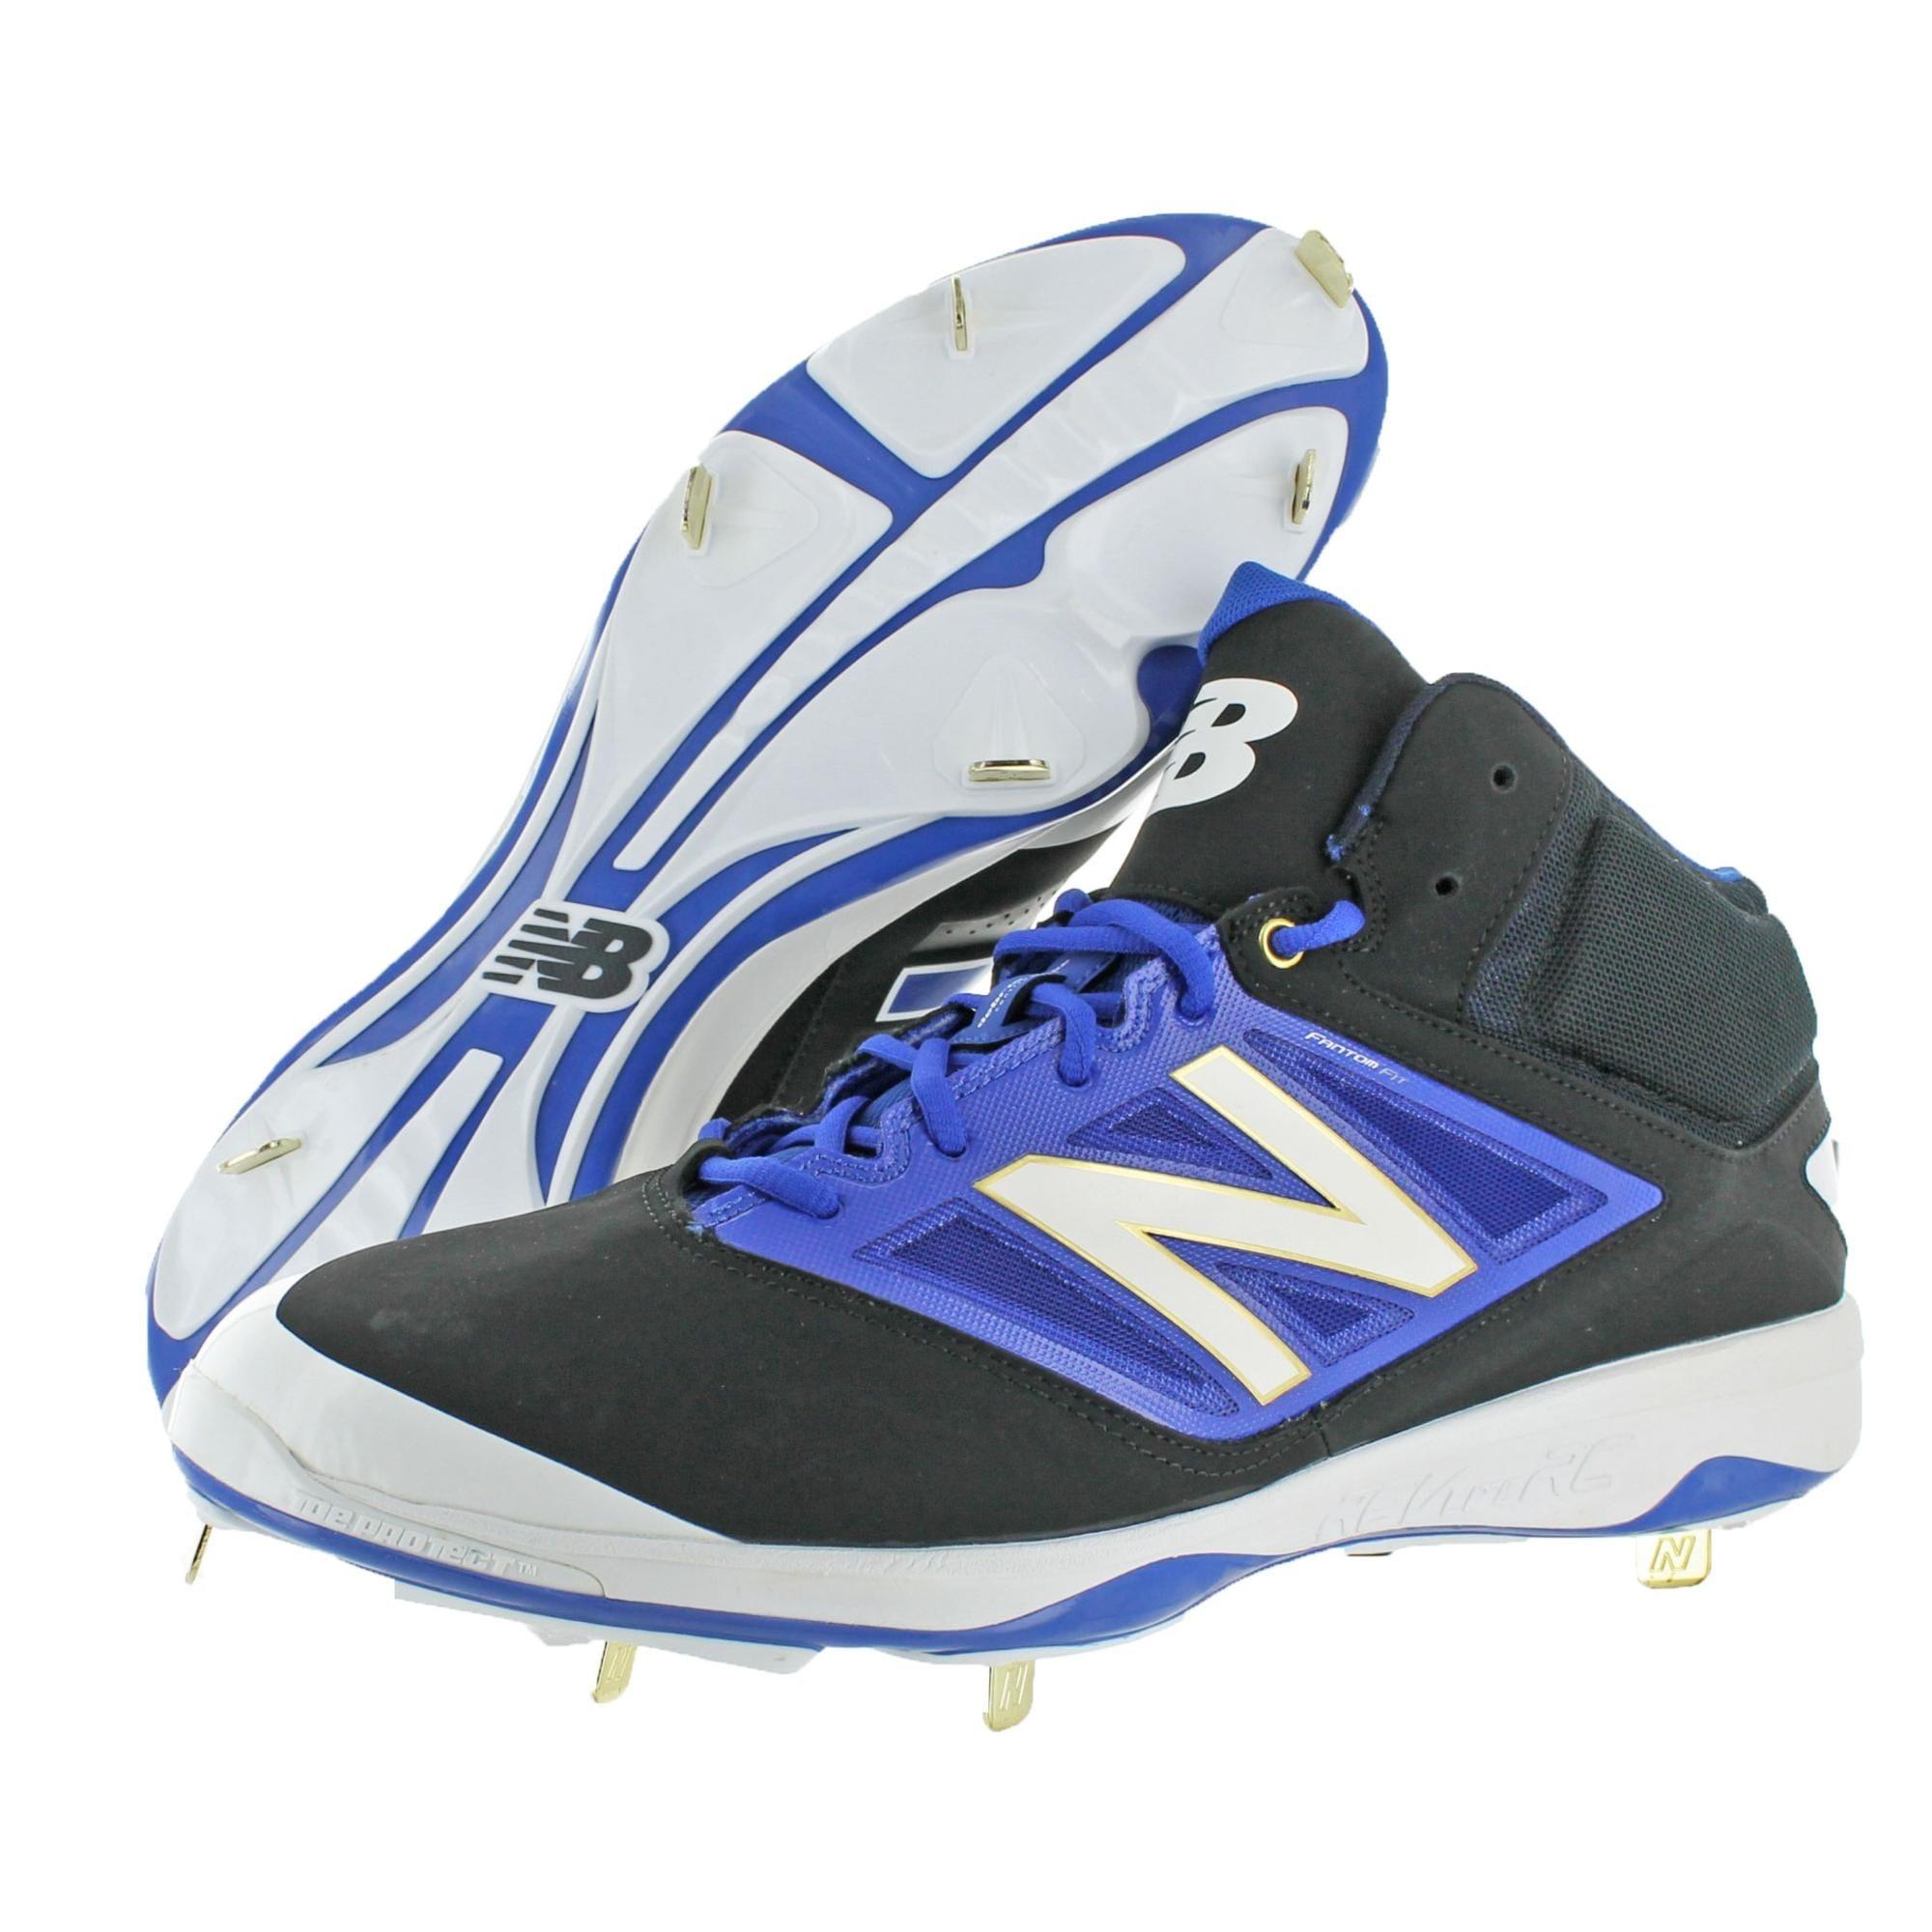 Shop New Balance Mens Cleats Baseball